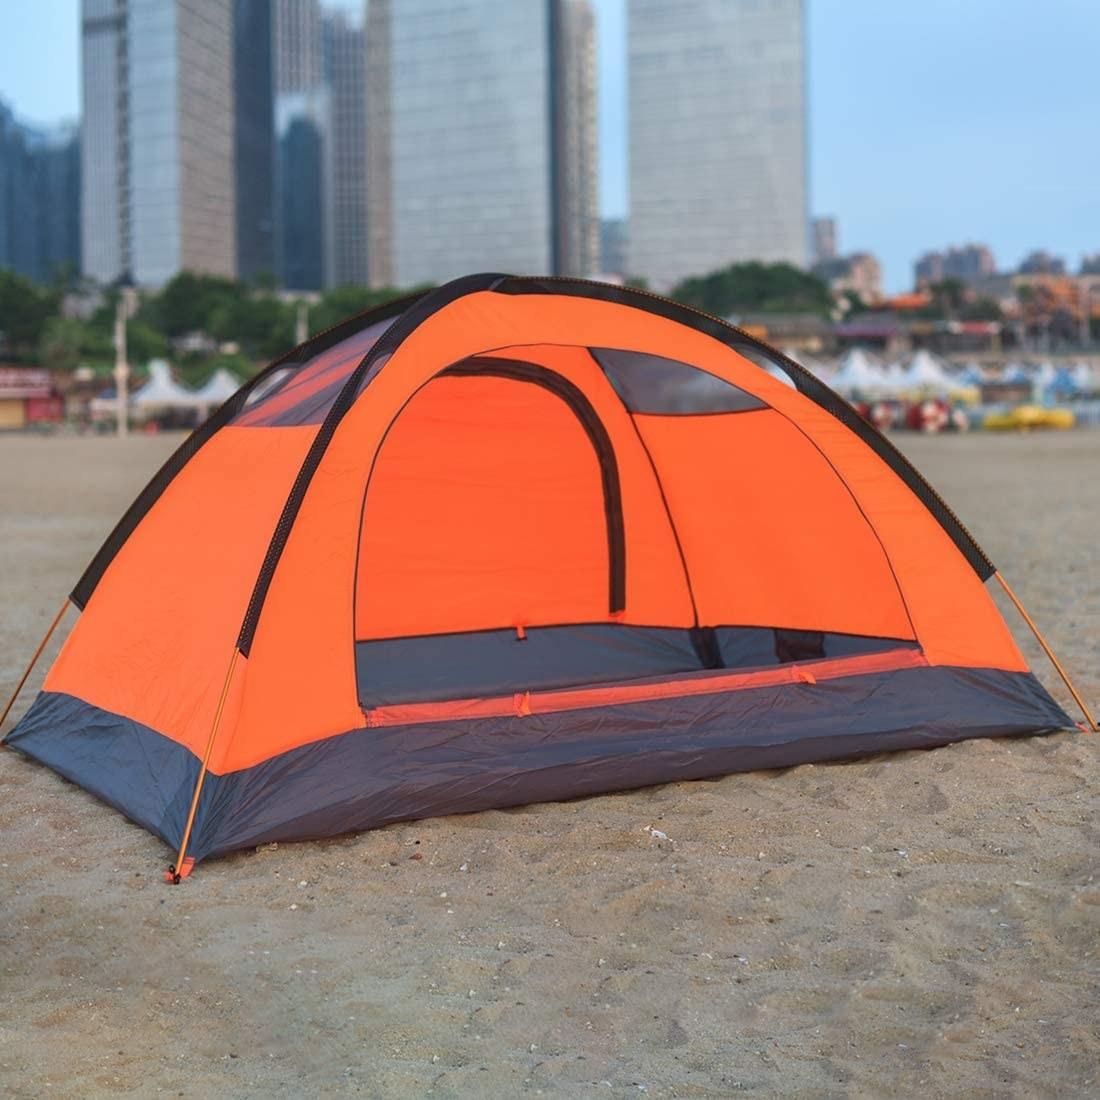 the tent on a beach